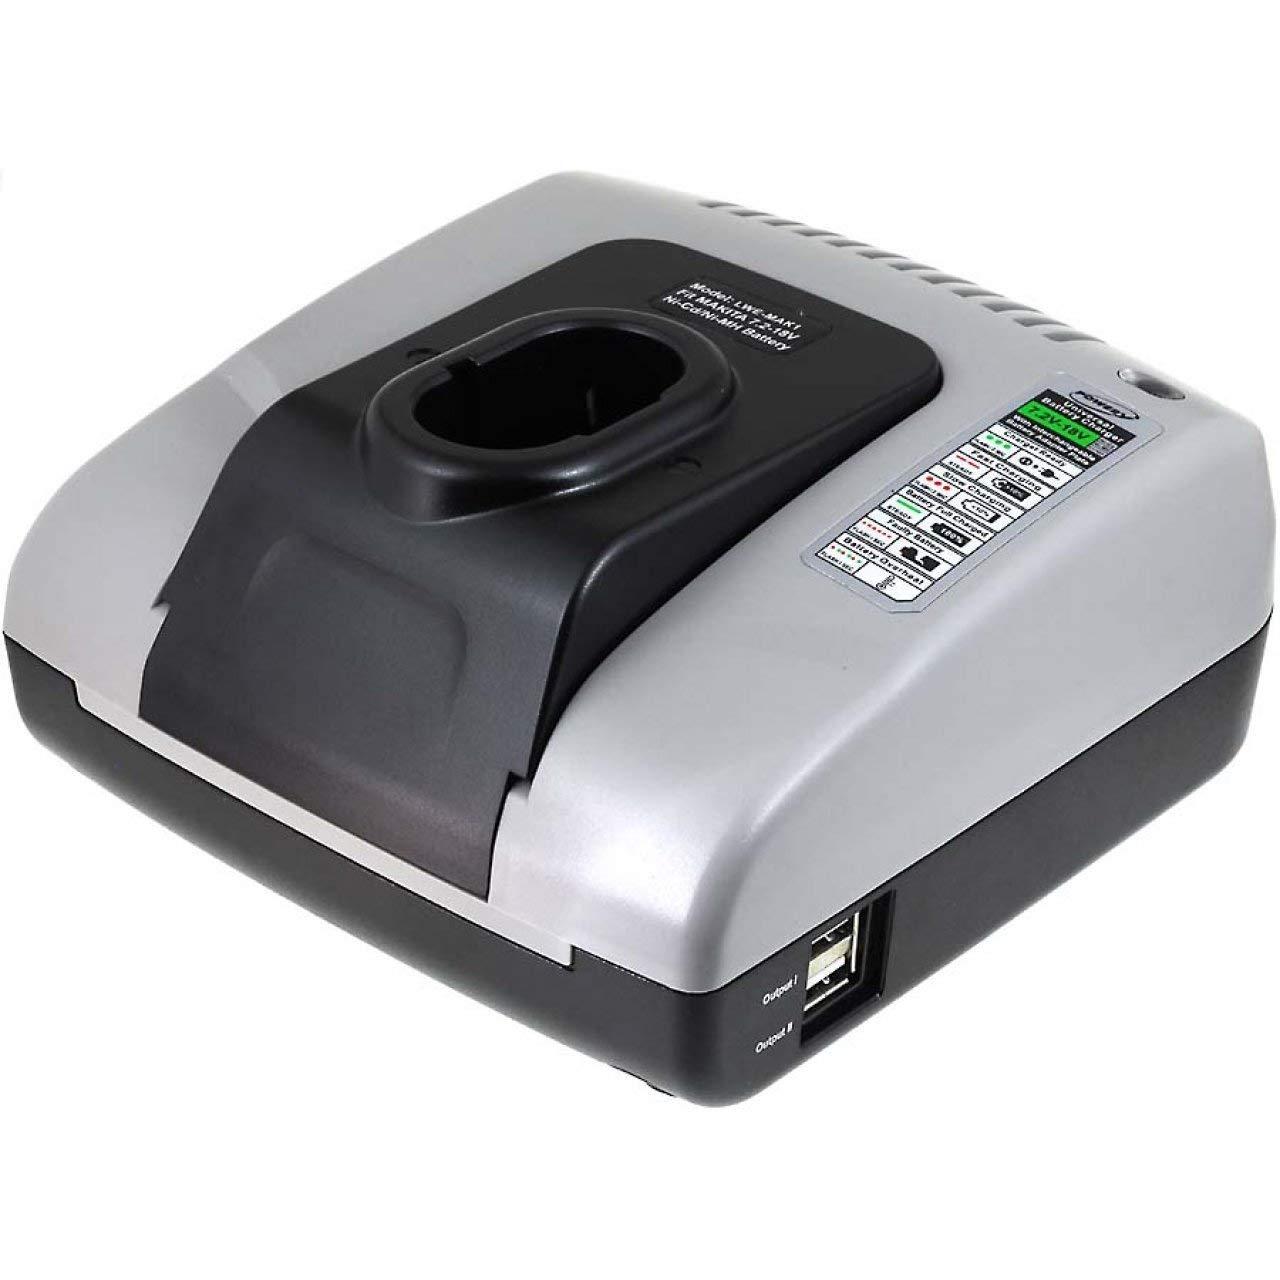 7,2V-18V akku-net Akku-Ladeger/ät mit USB f/ür Makita Elekronik-Bohrschrauber Power-Line 6317D